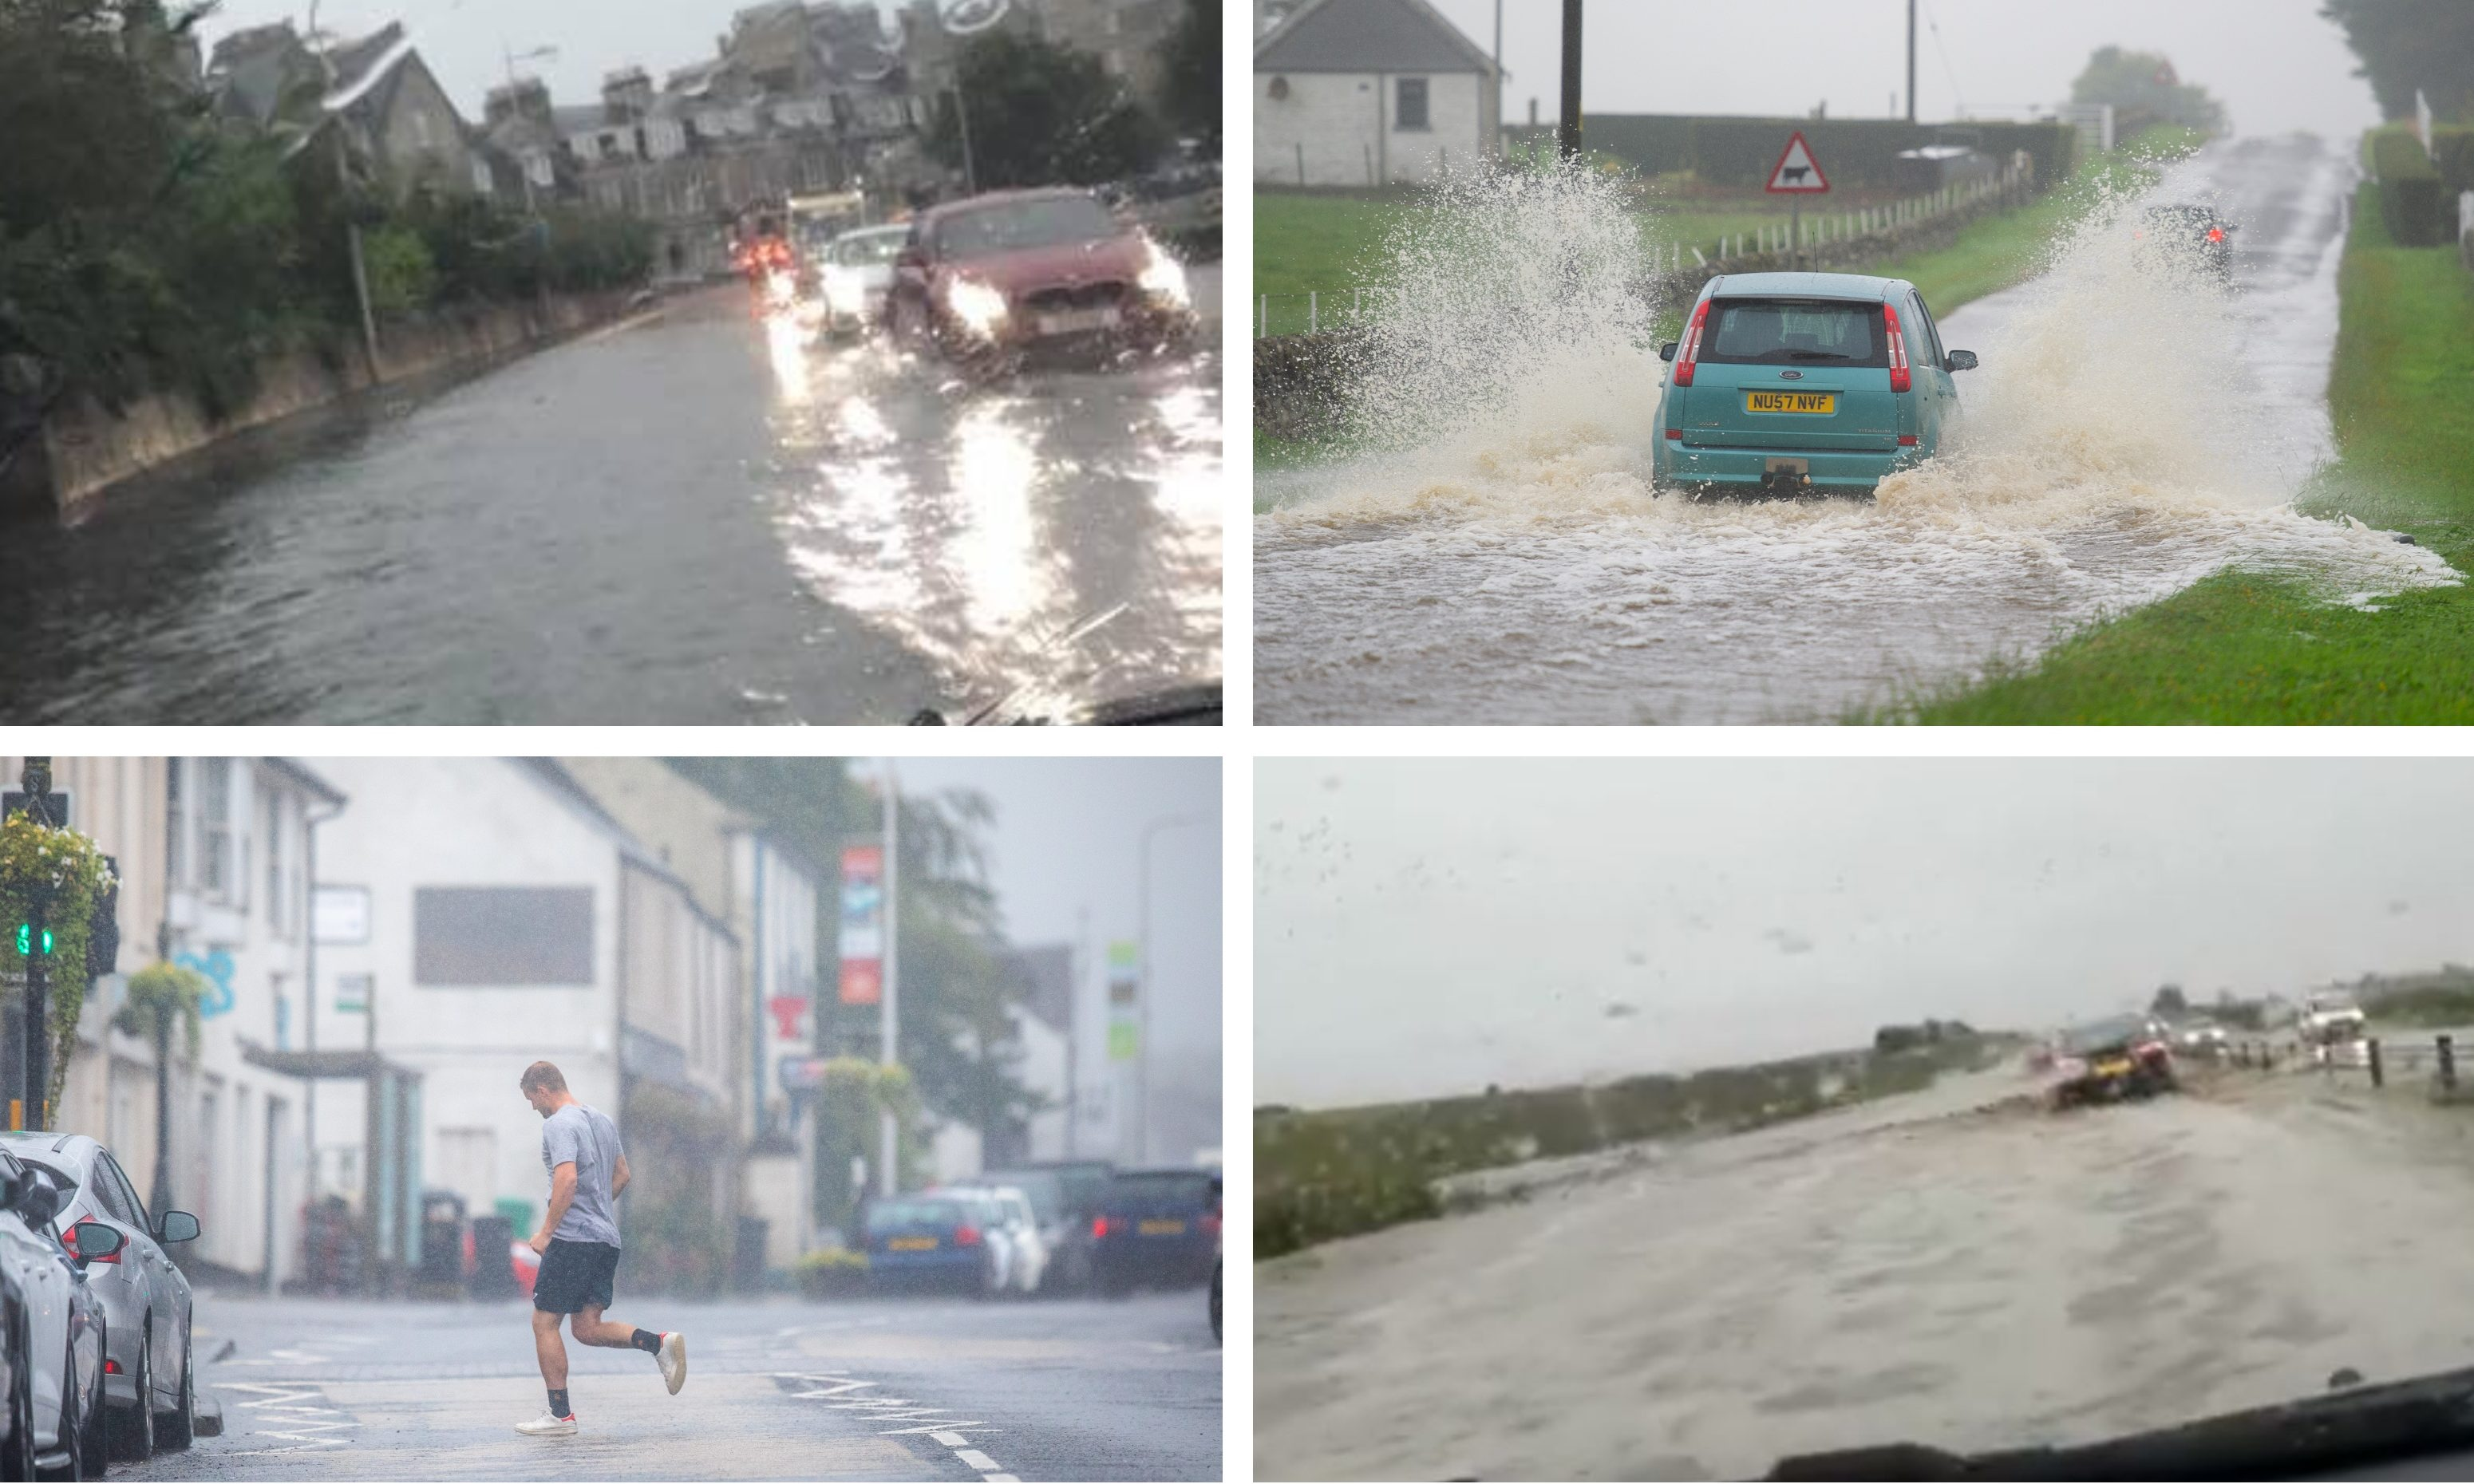 Flooding across Tayside and Fife.